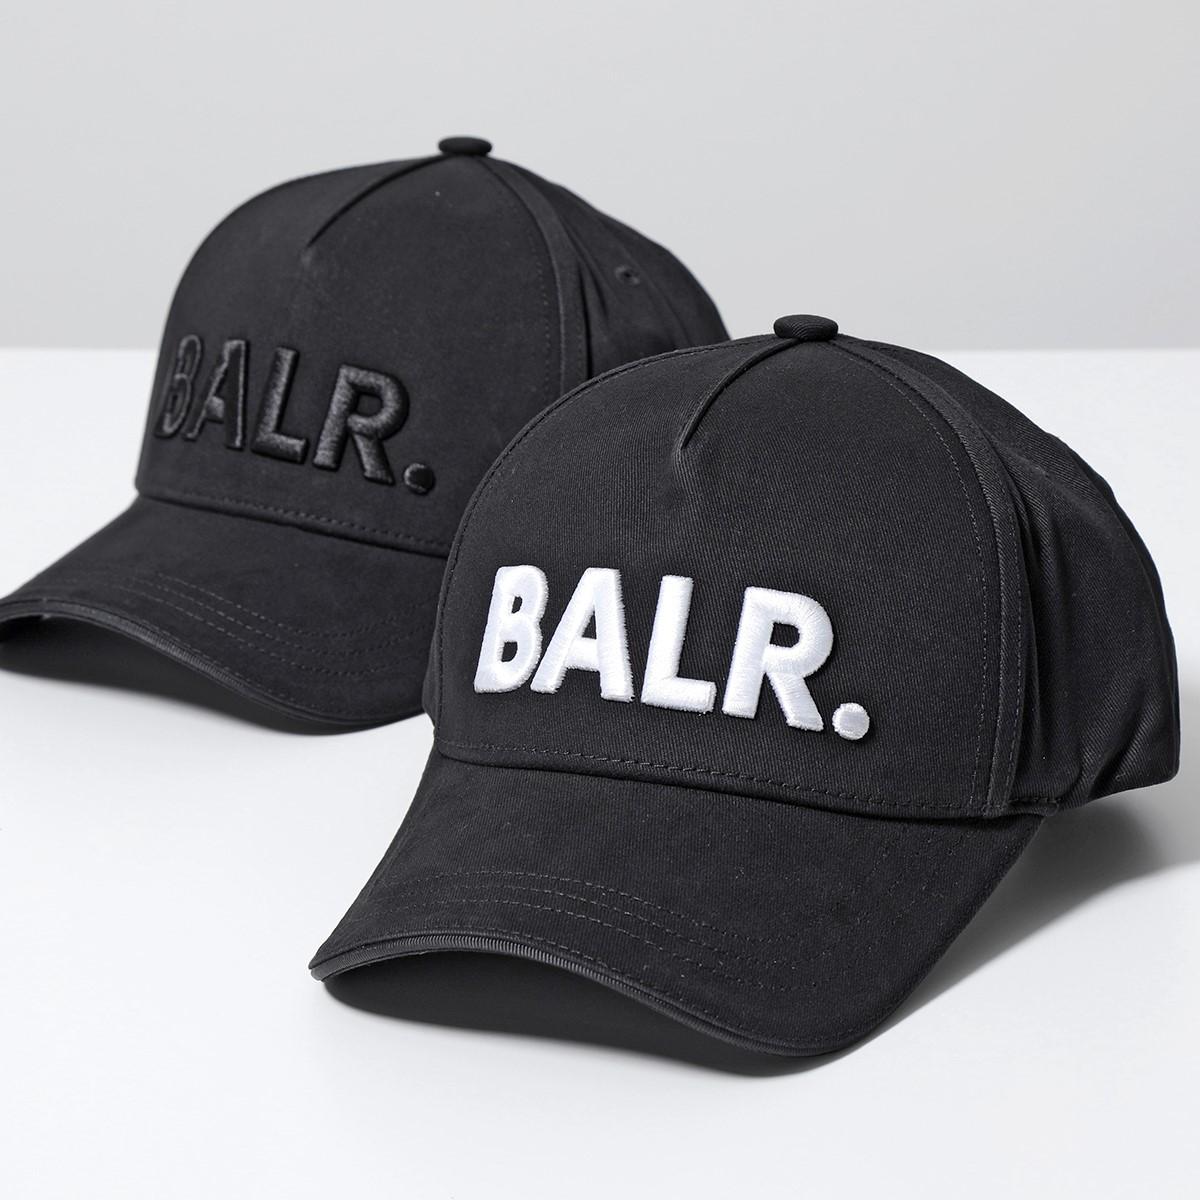 BALR. 買い物 ボーラー Classic Cotton 供え Cap B10015 コットン ベースボールキャップ Black 立体ロゴ刺繍 メンズ 帽子